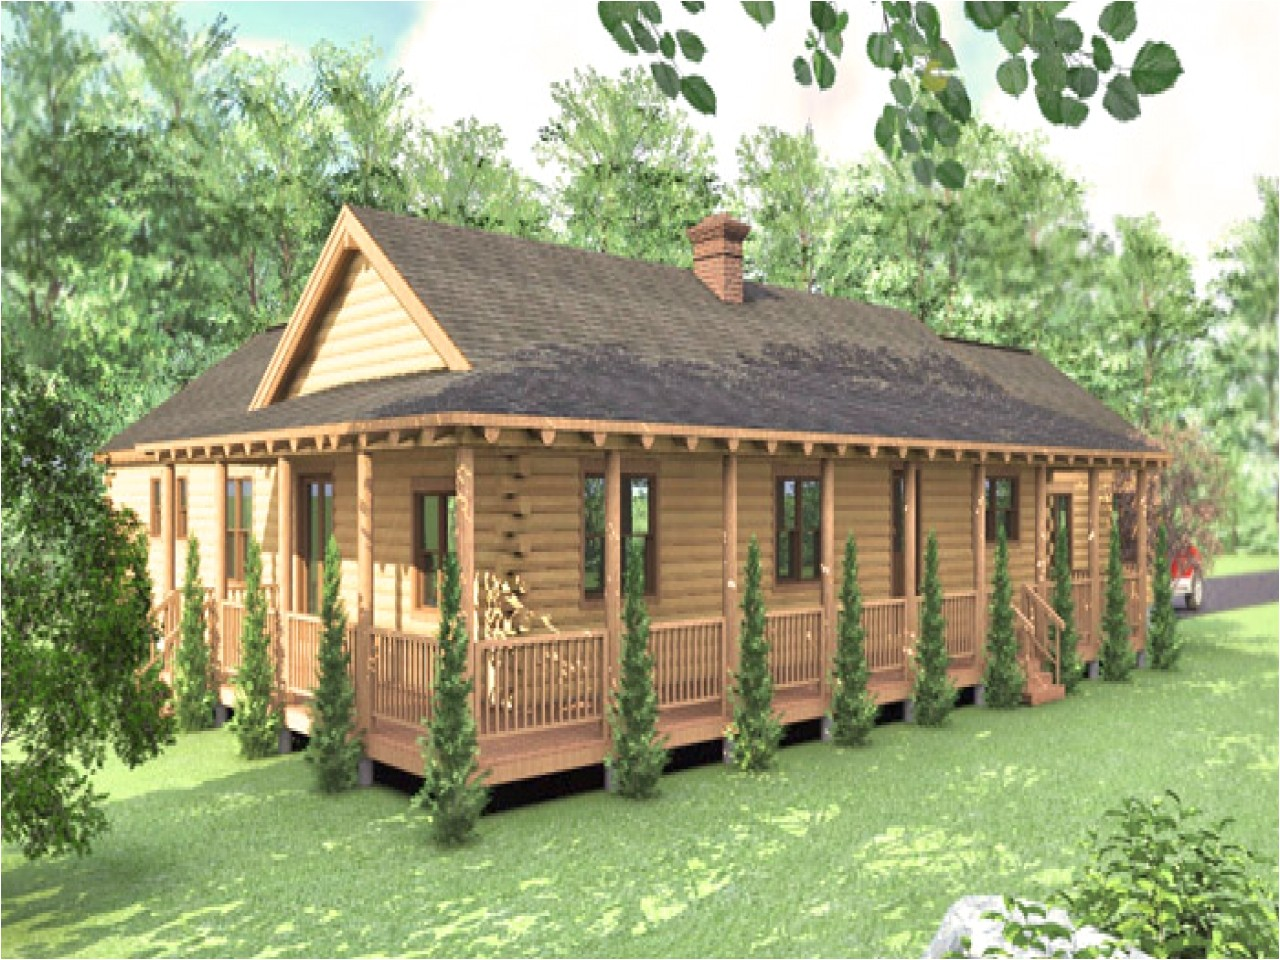 808ffcf16979b803 log cabin ranch style home plans log ranchers homes